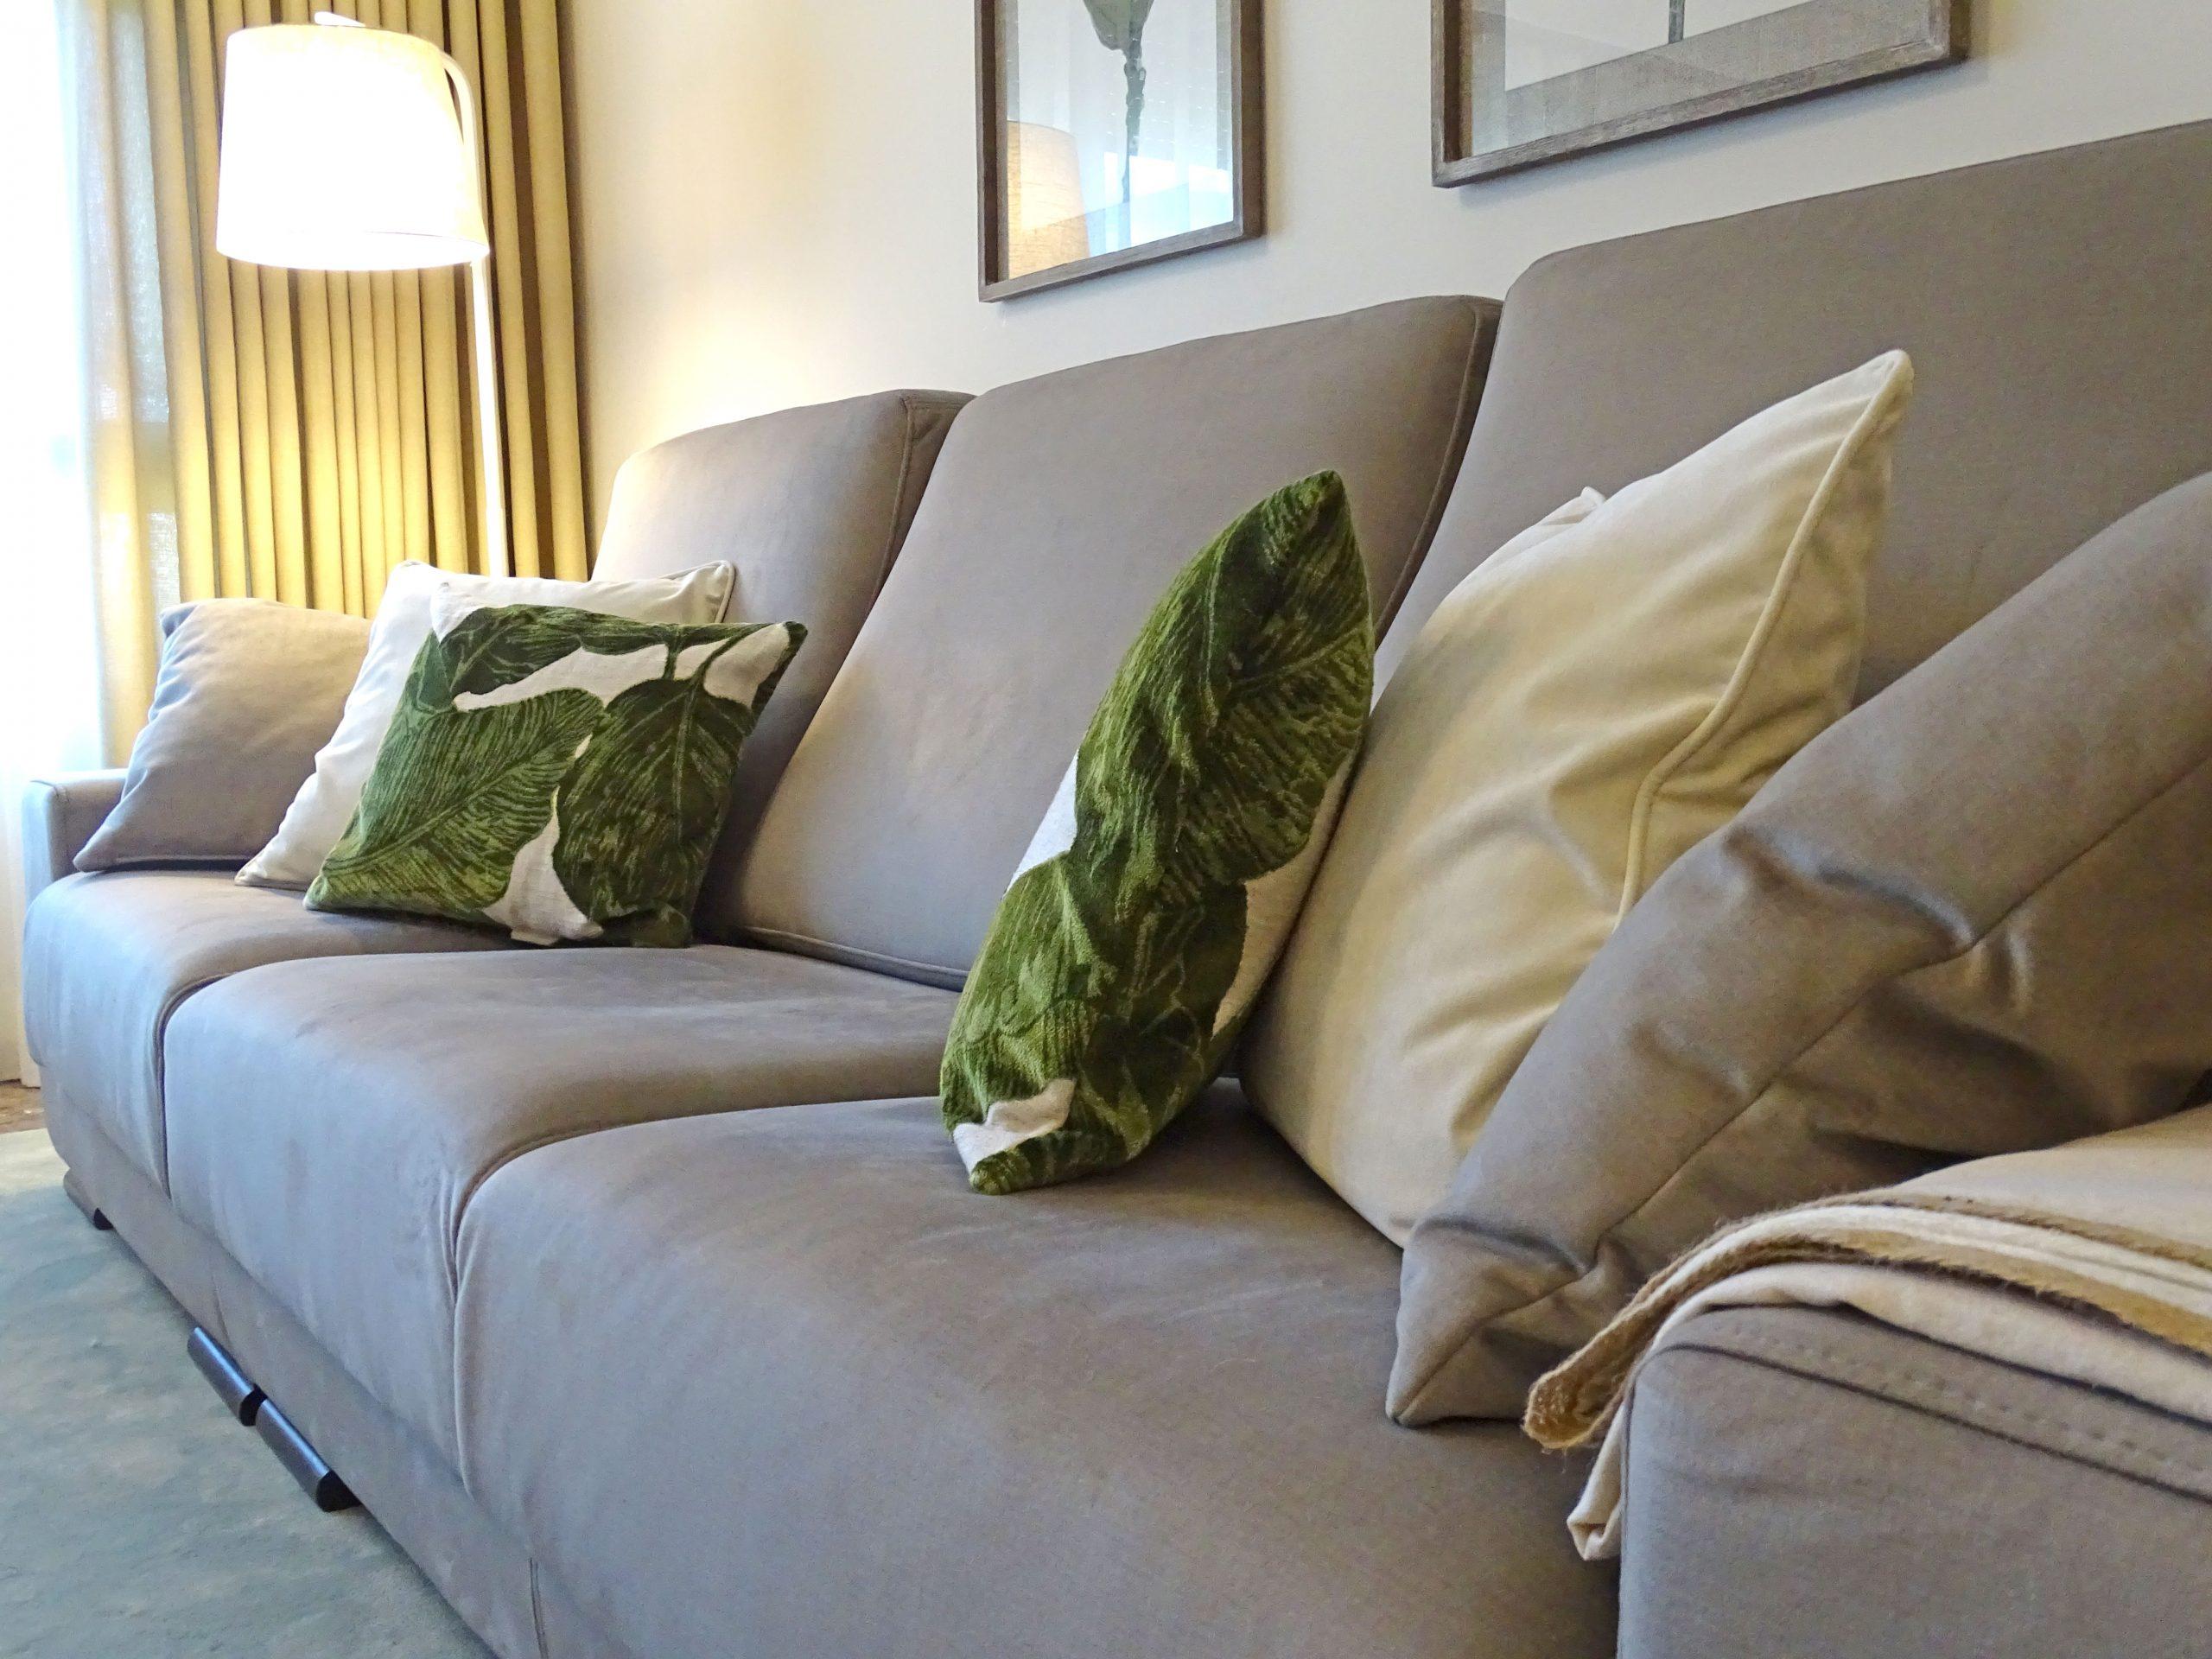 Tresarenes - Reforma de una vivienda en Alzira